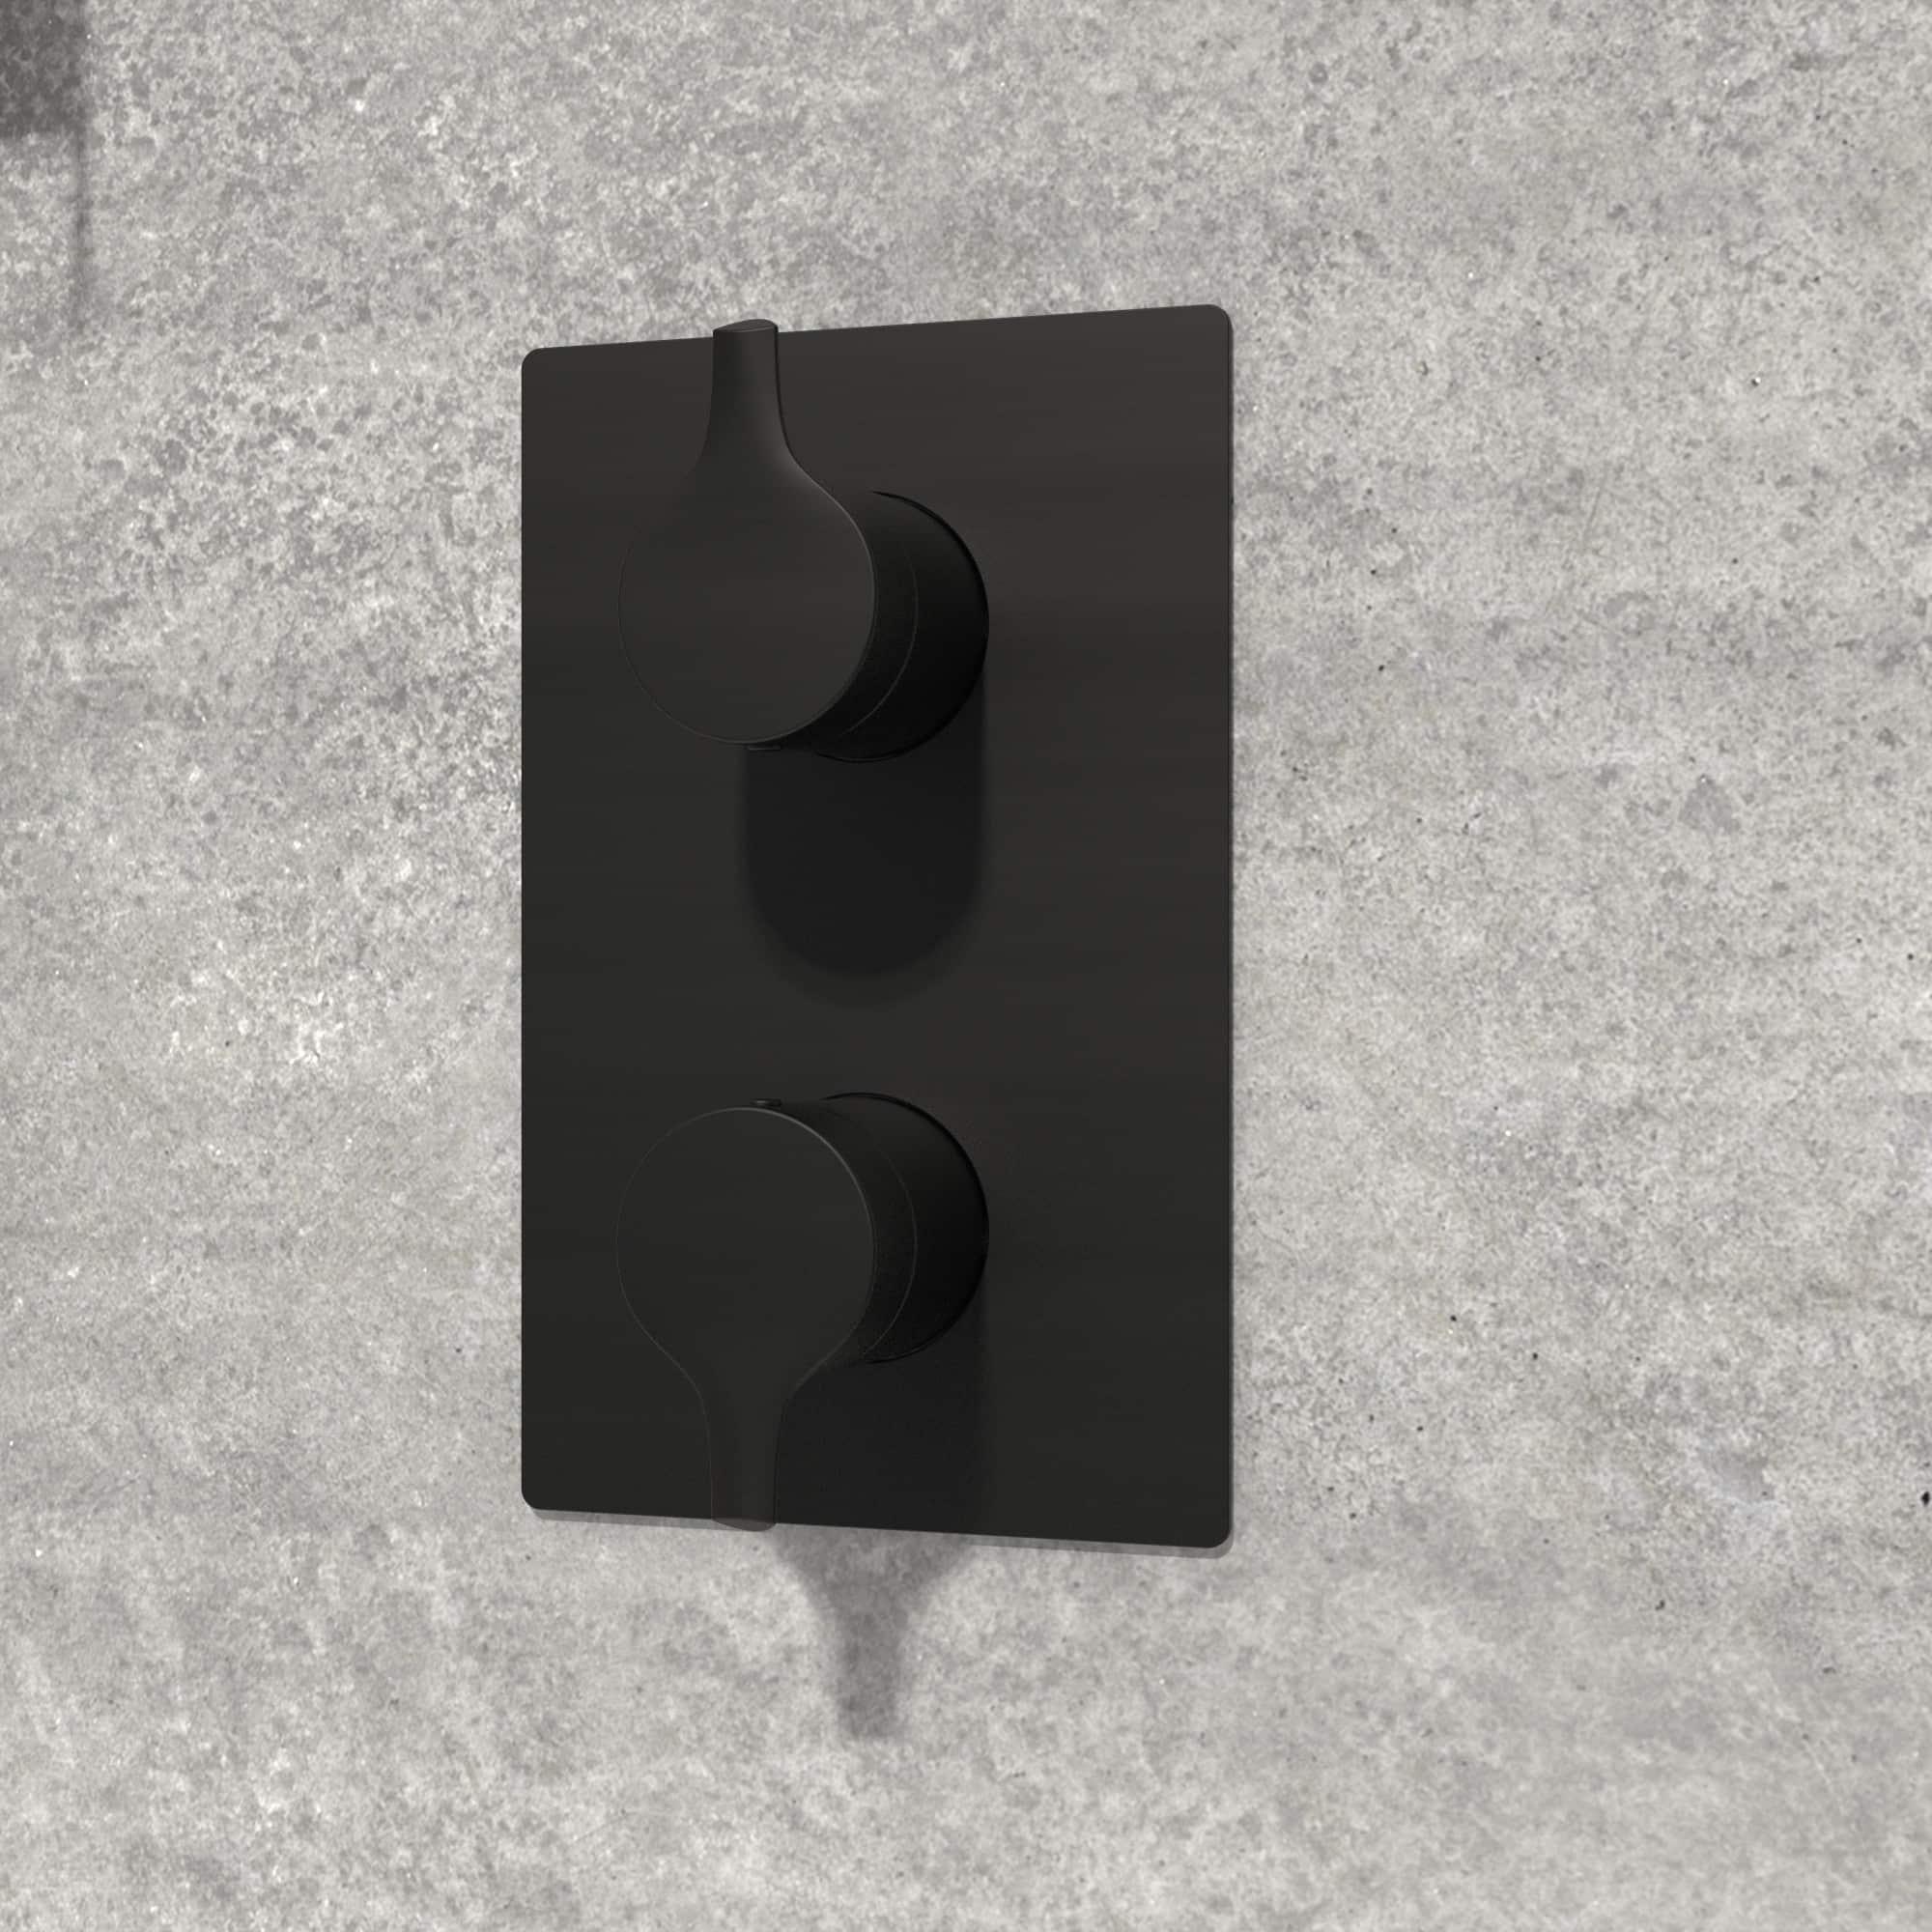 NOB98TS2TMB valve de robinet noir mat sur mur de pierre